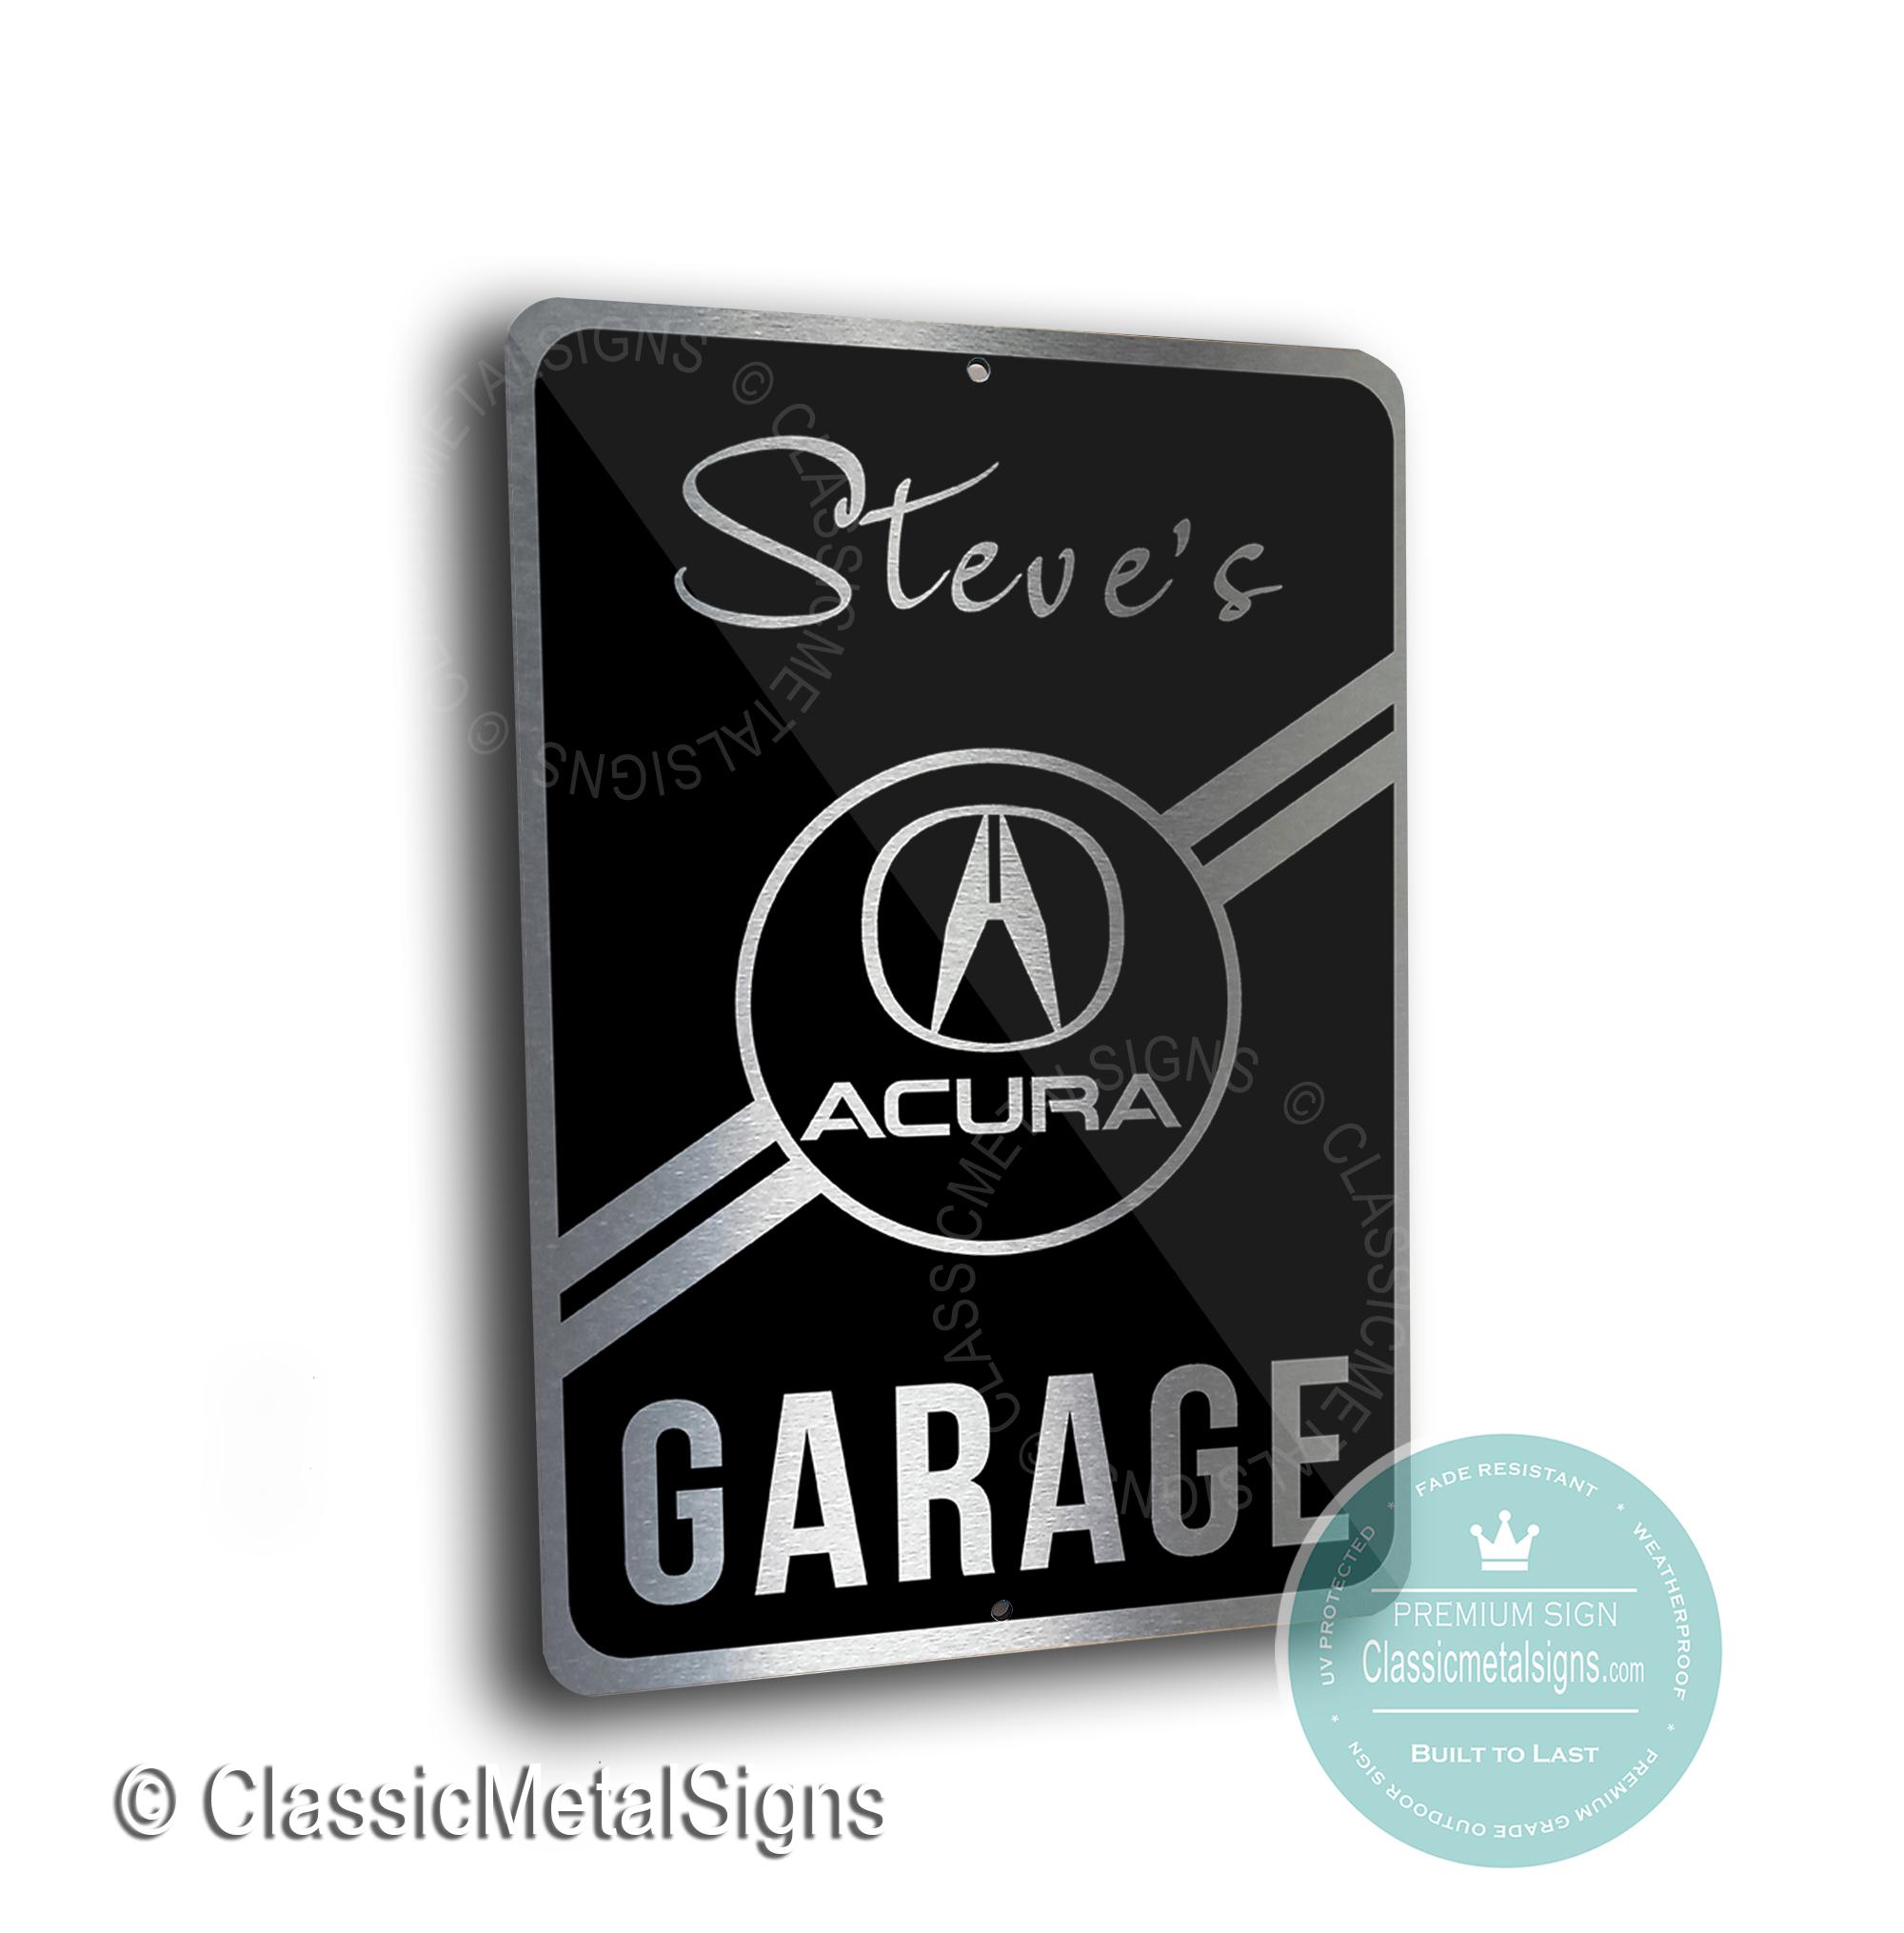 Acura Garage Signs